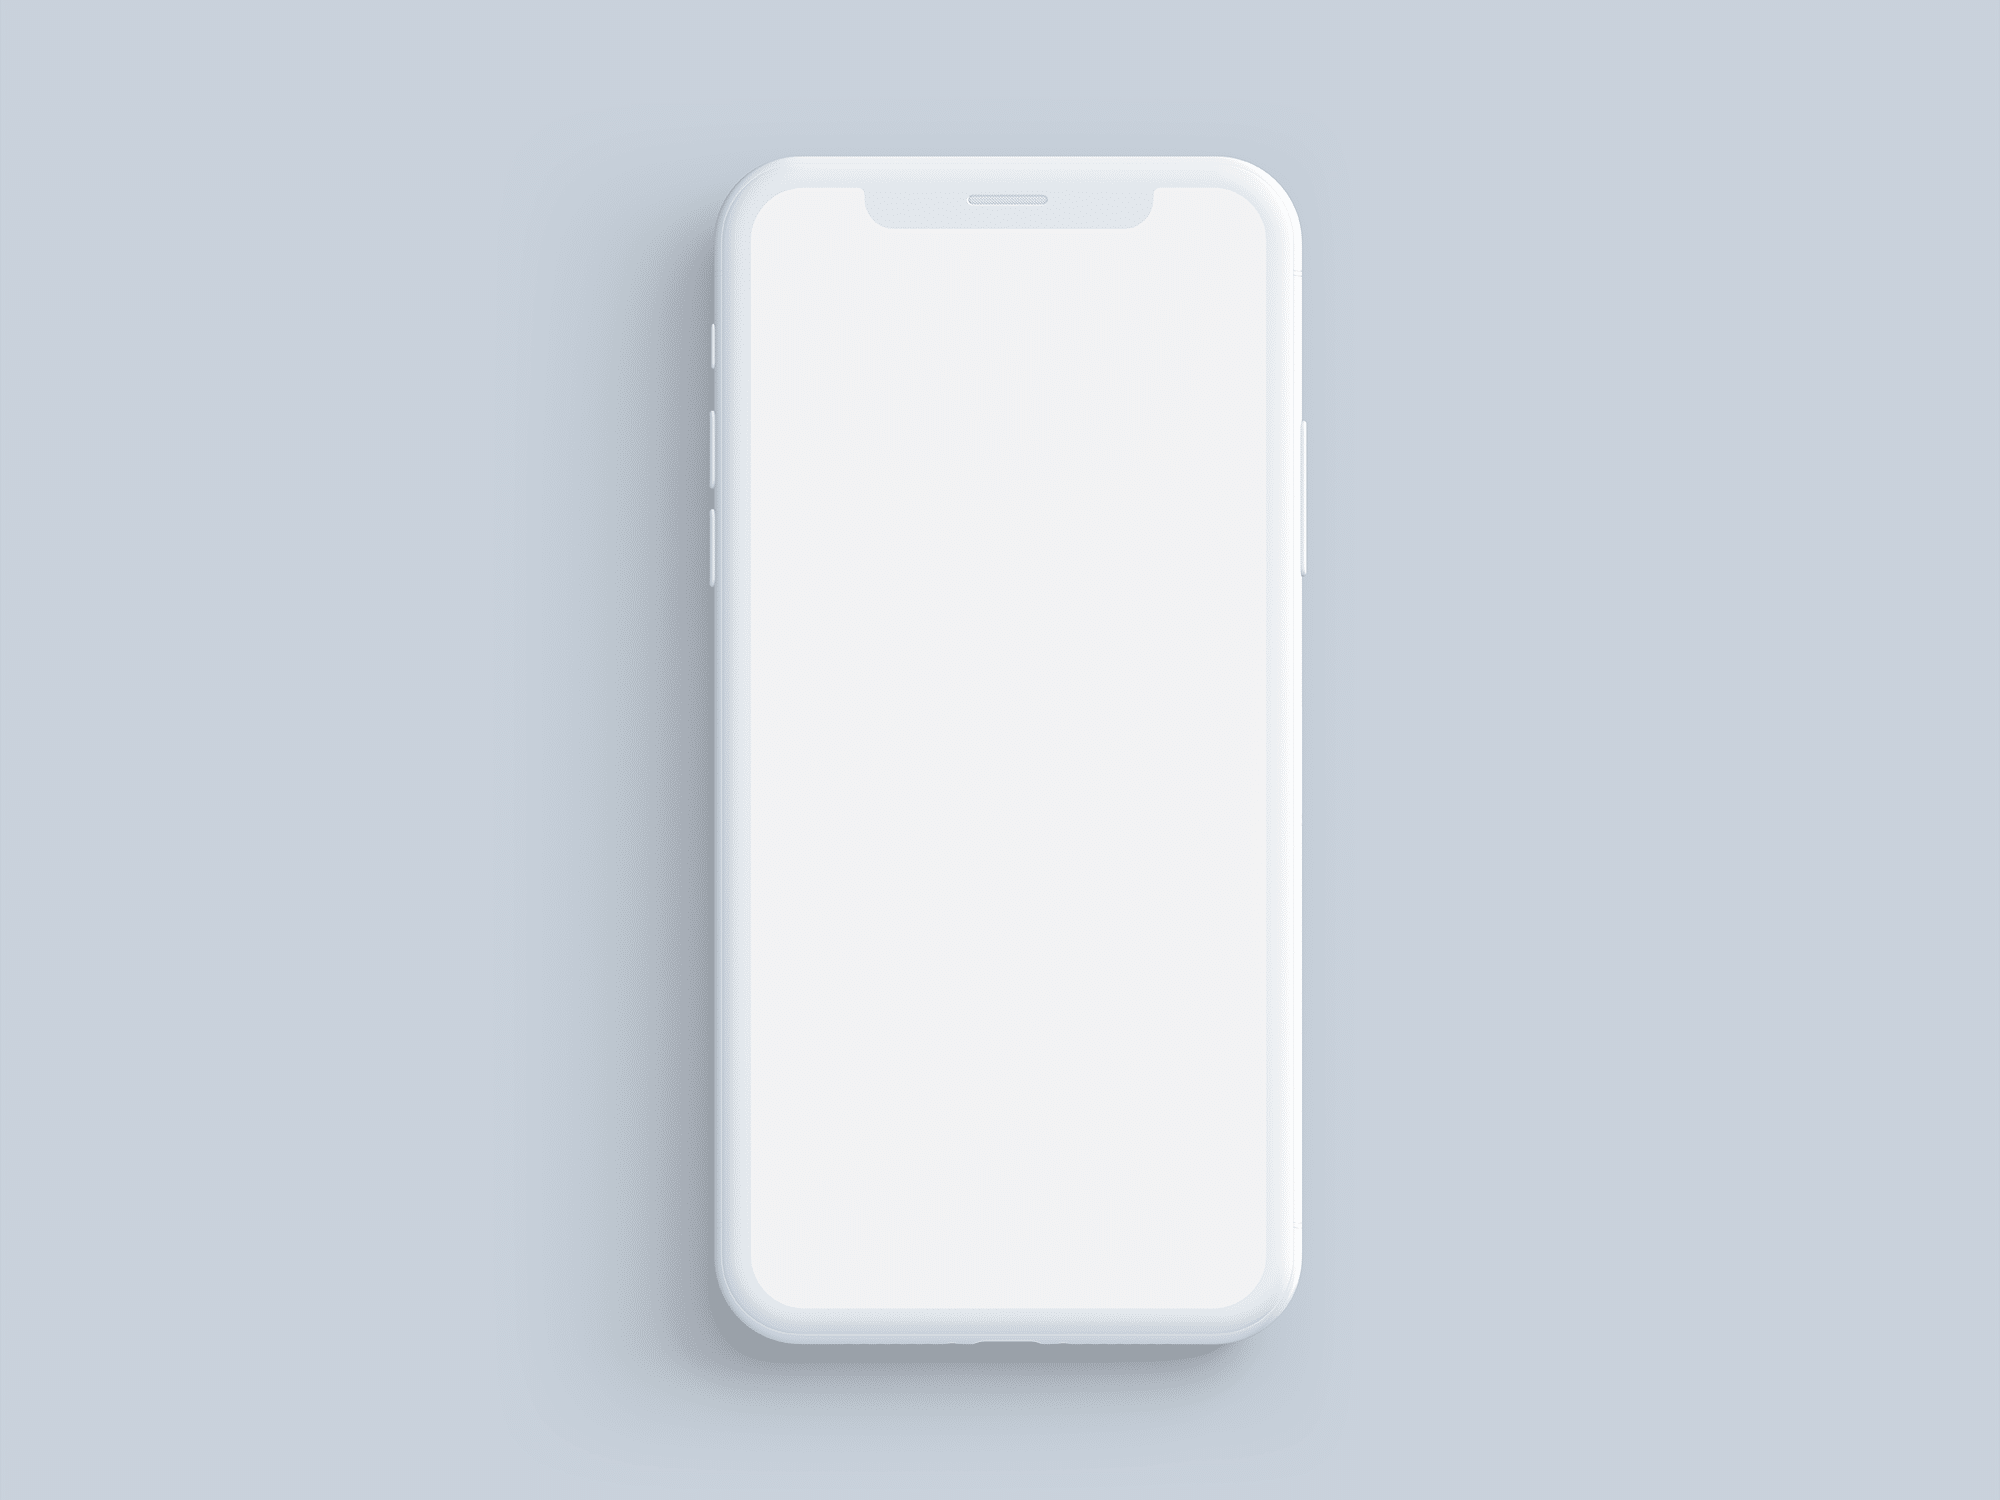 Download Simple Customizable Iphone X Mockups The Mockup Club Iphone Mockup Free Iphone Mockup Imac